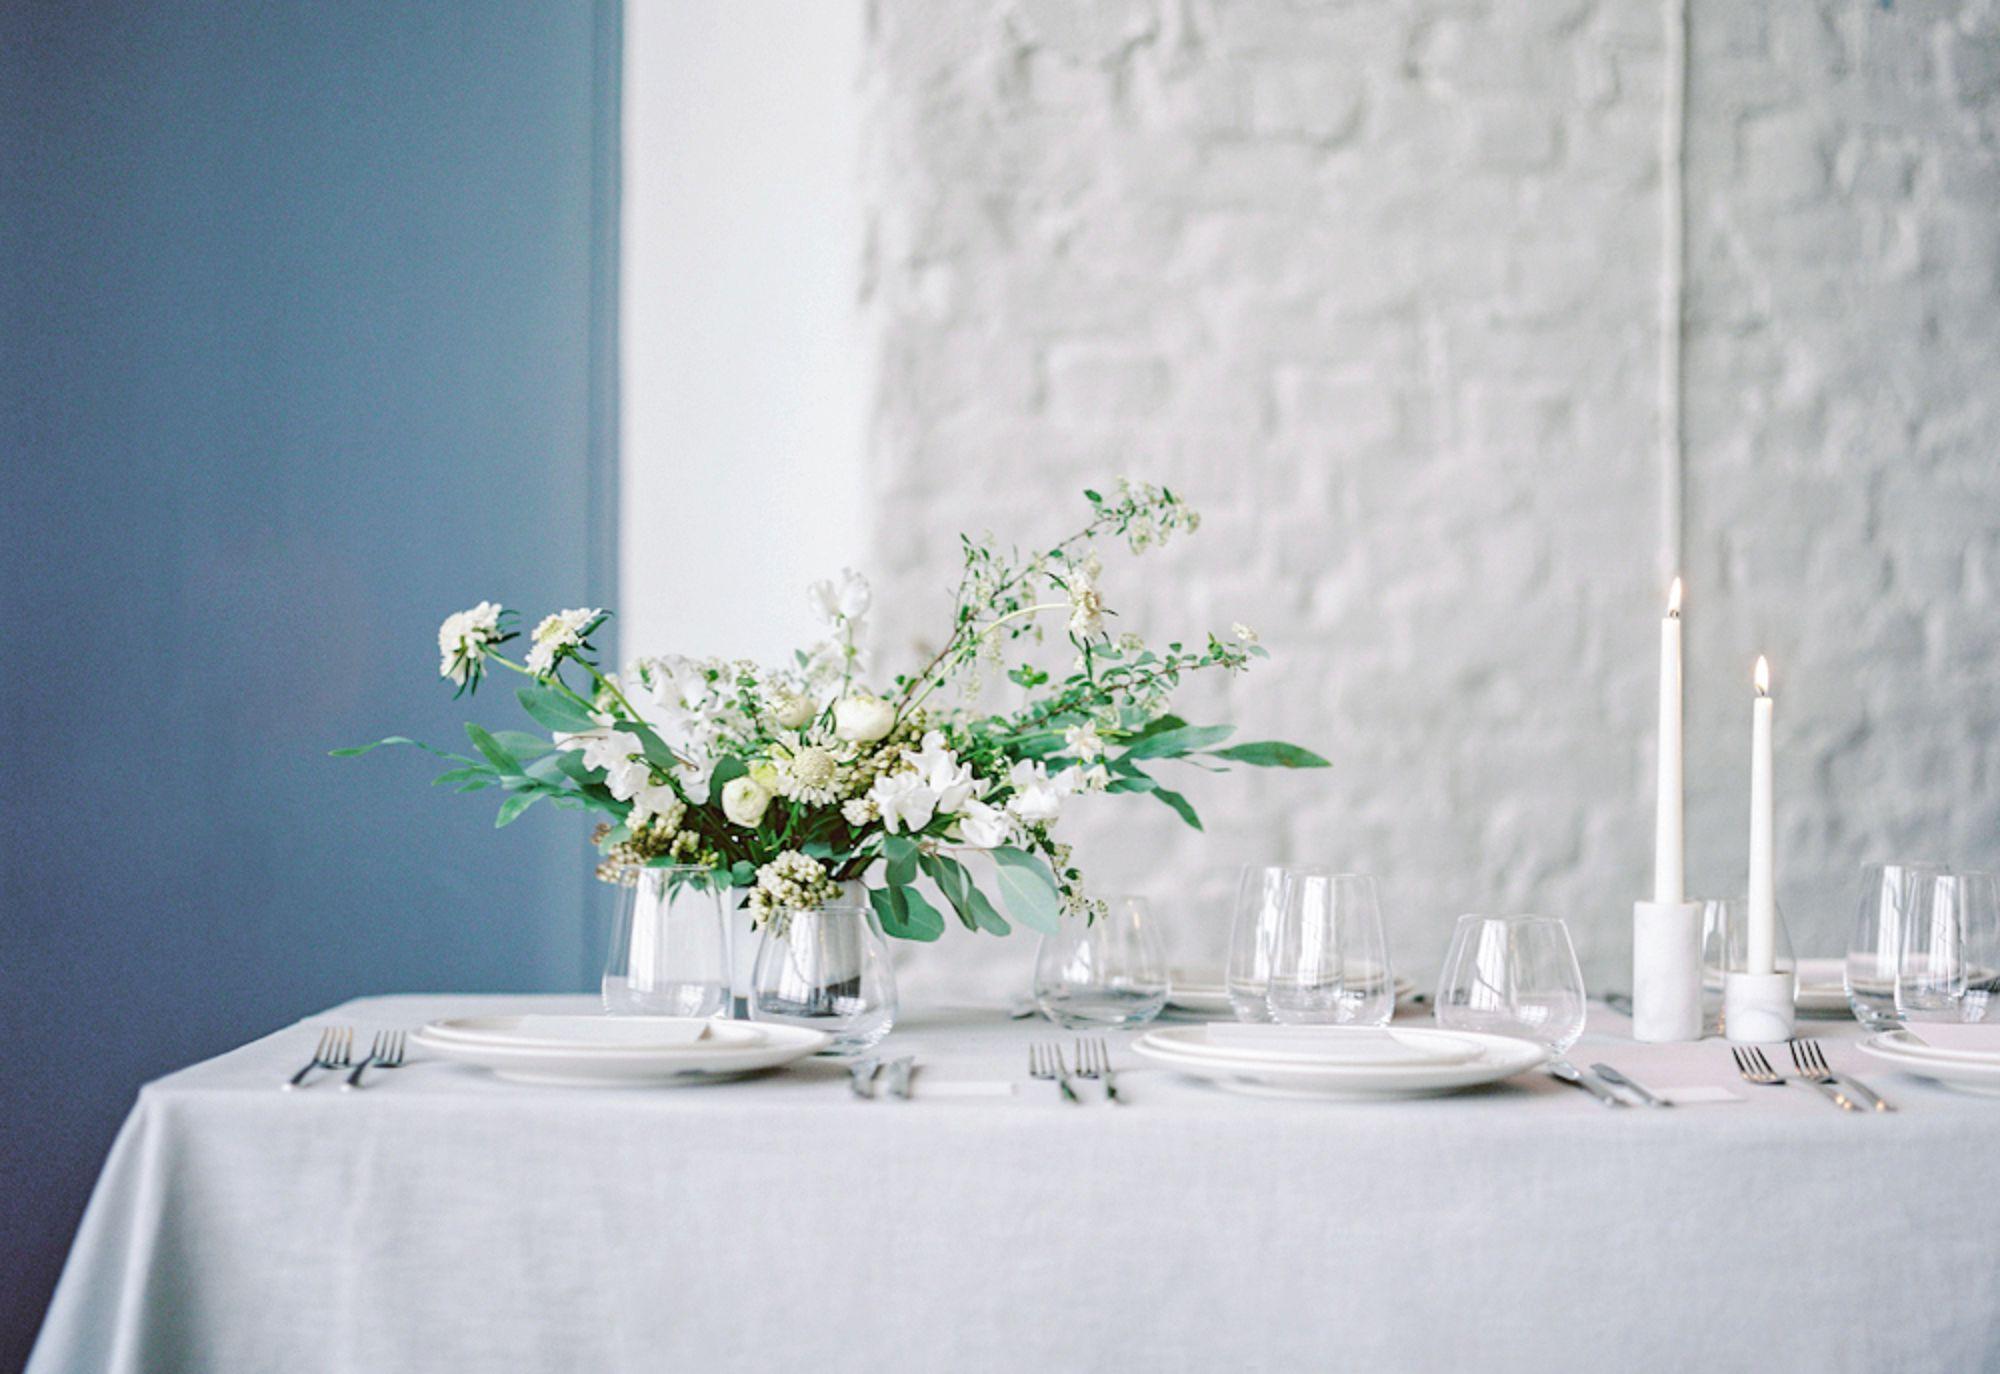 katja-scherle-festtagsfotografien_berlin-hamburg-filmweddingphotographer-hochzeitsfotograf-analog-minimalistic-wedding_0053